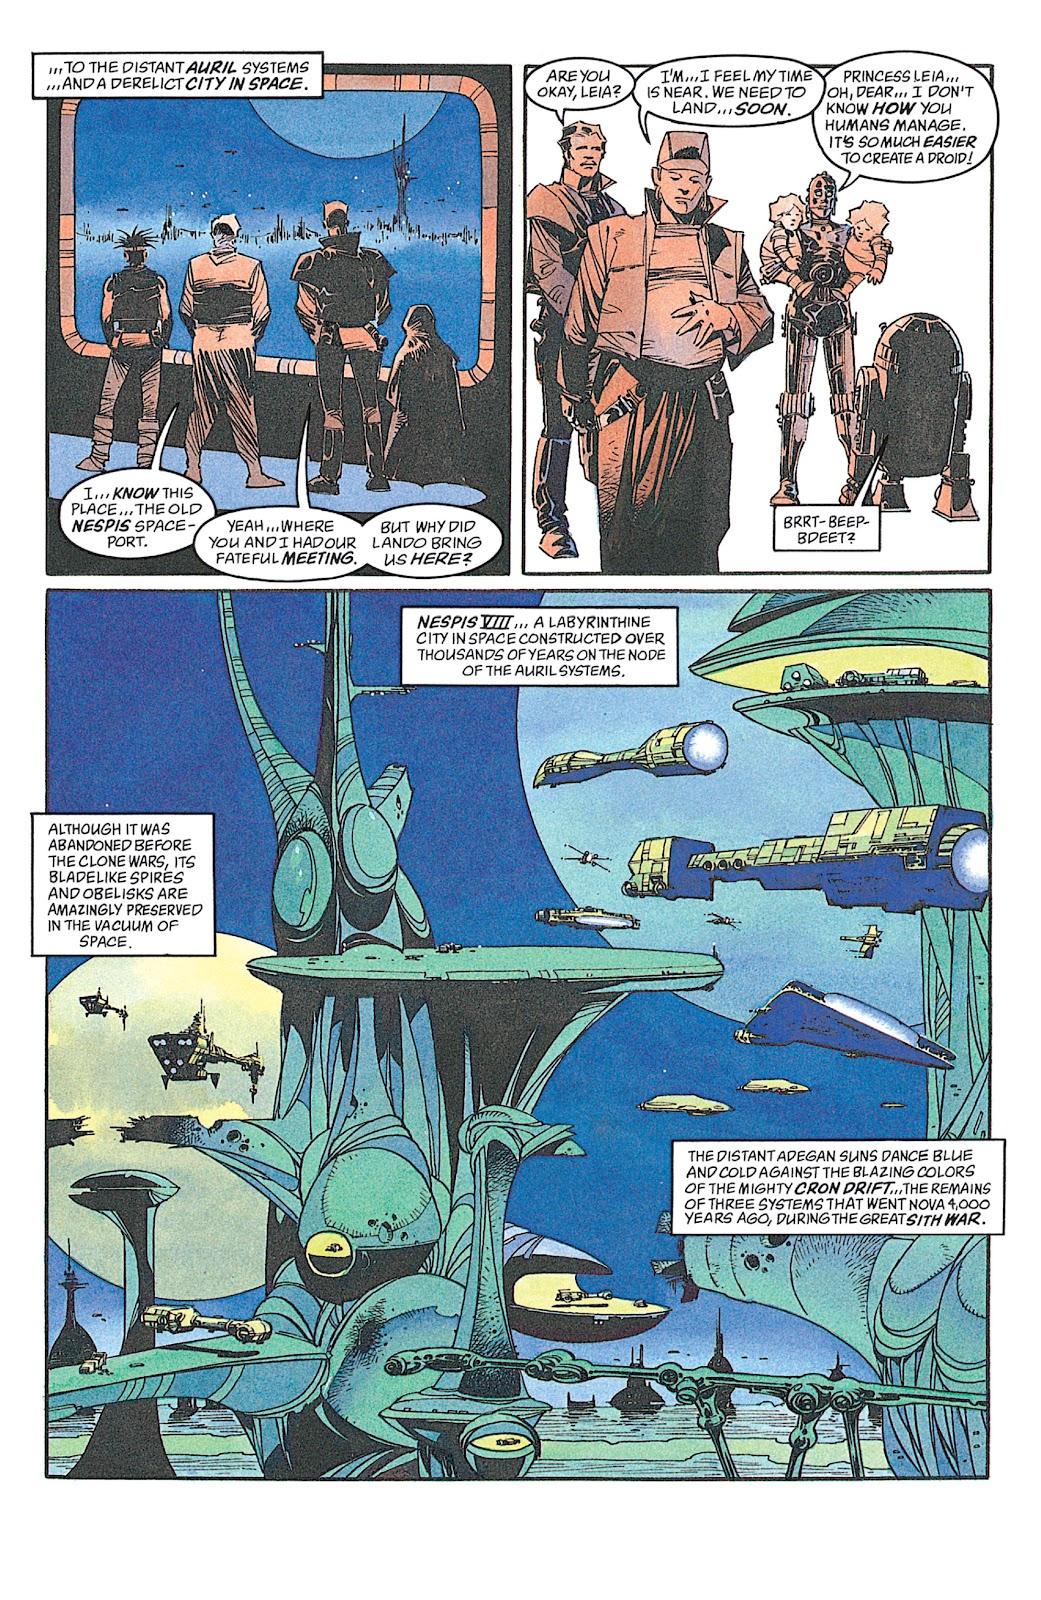 Read online Star Wars: Dark Empire Trilogy comic -  Issue # TPB (Part 4) - 3